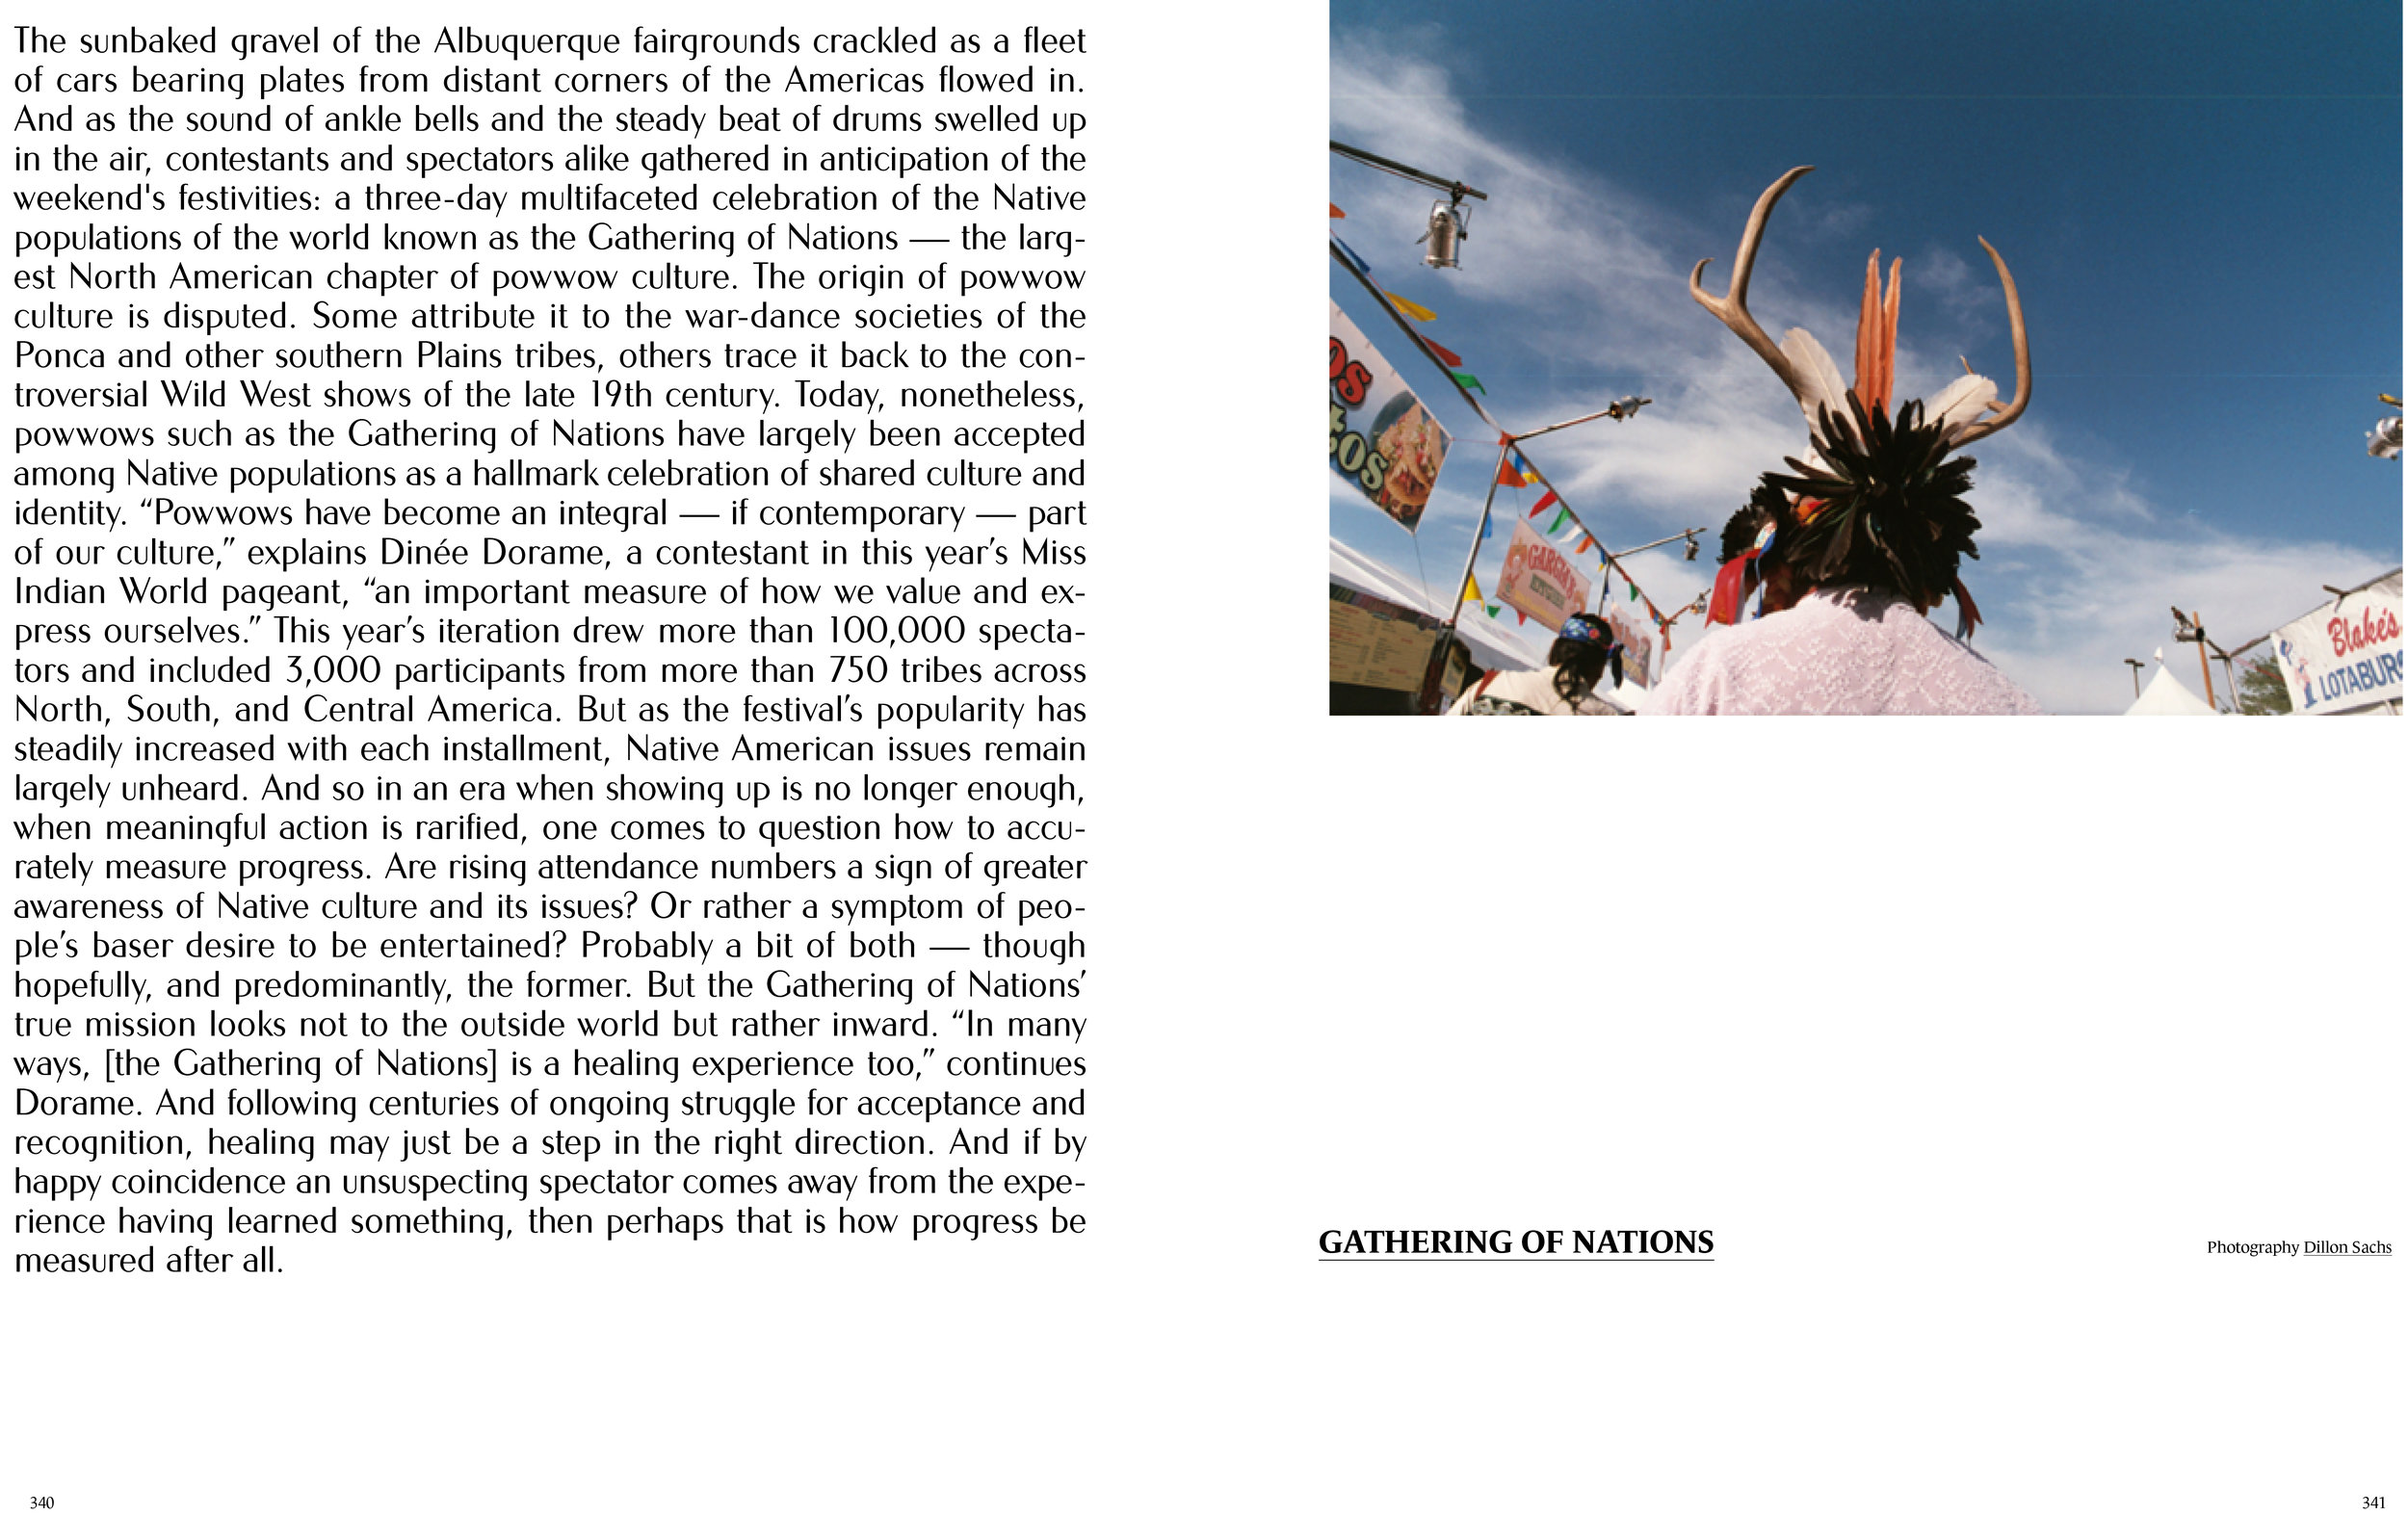 OOO—10—BAT—GATHERINGOFNATIONS 1.jpg